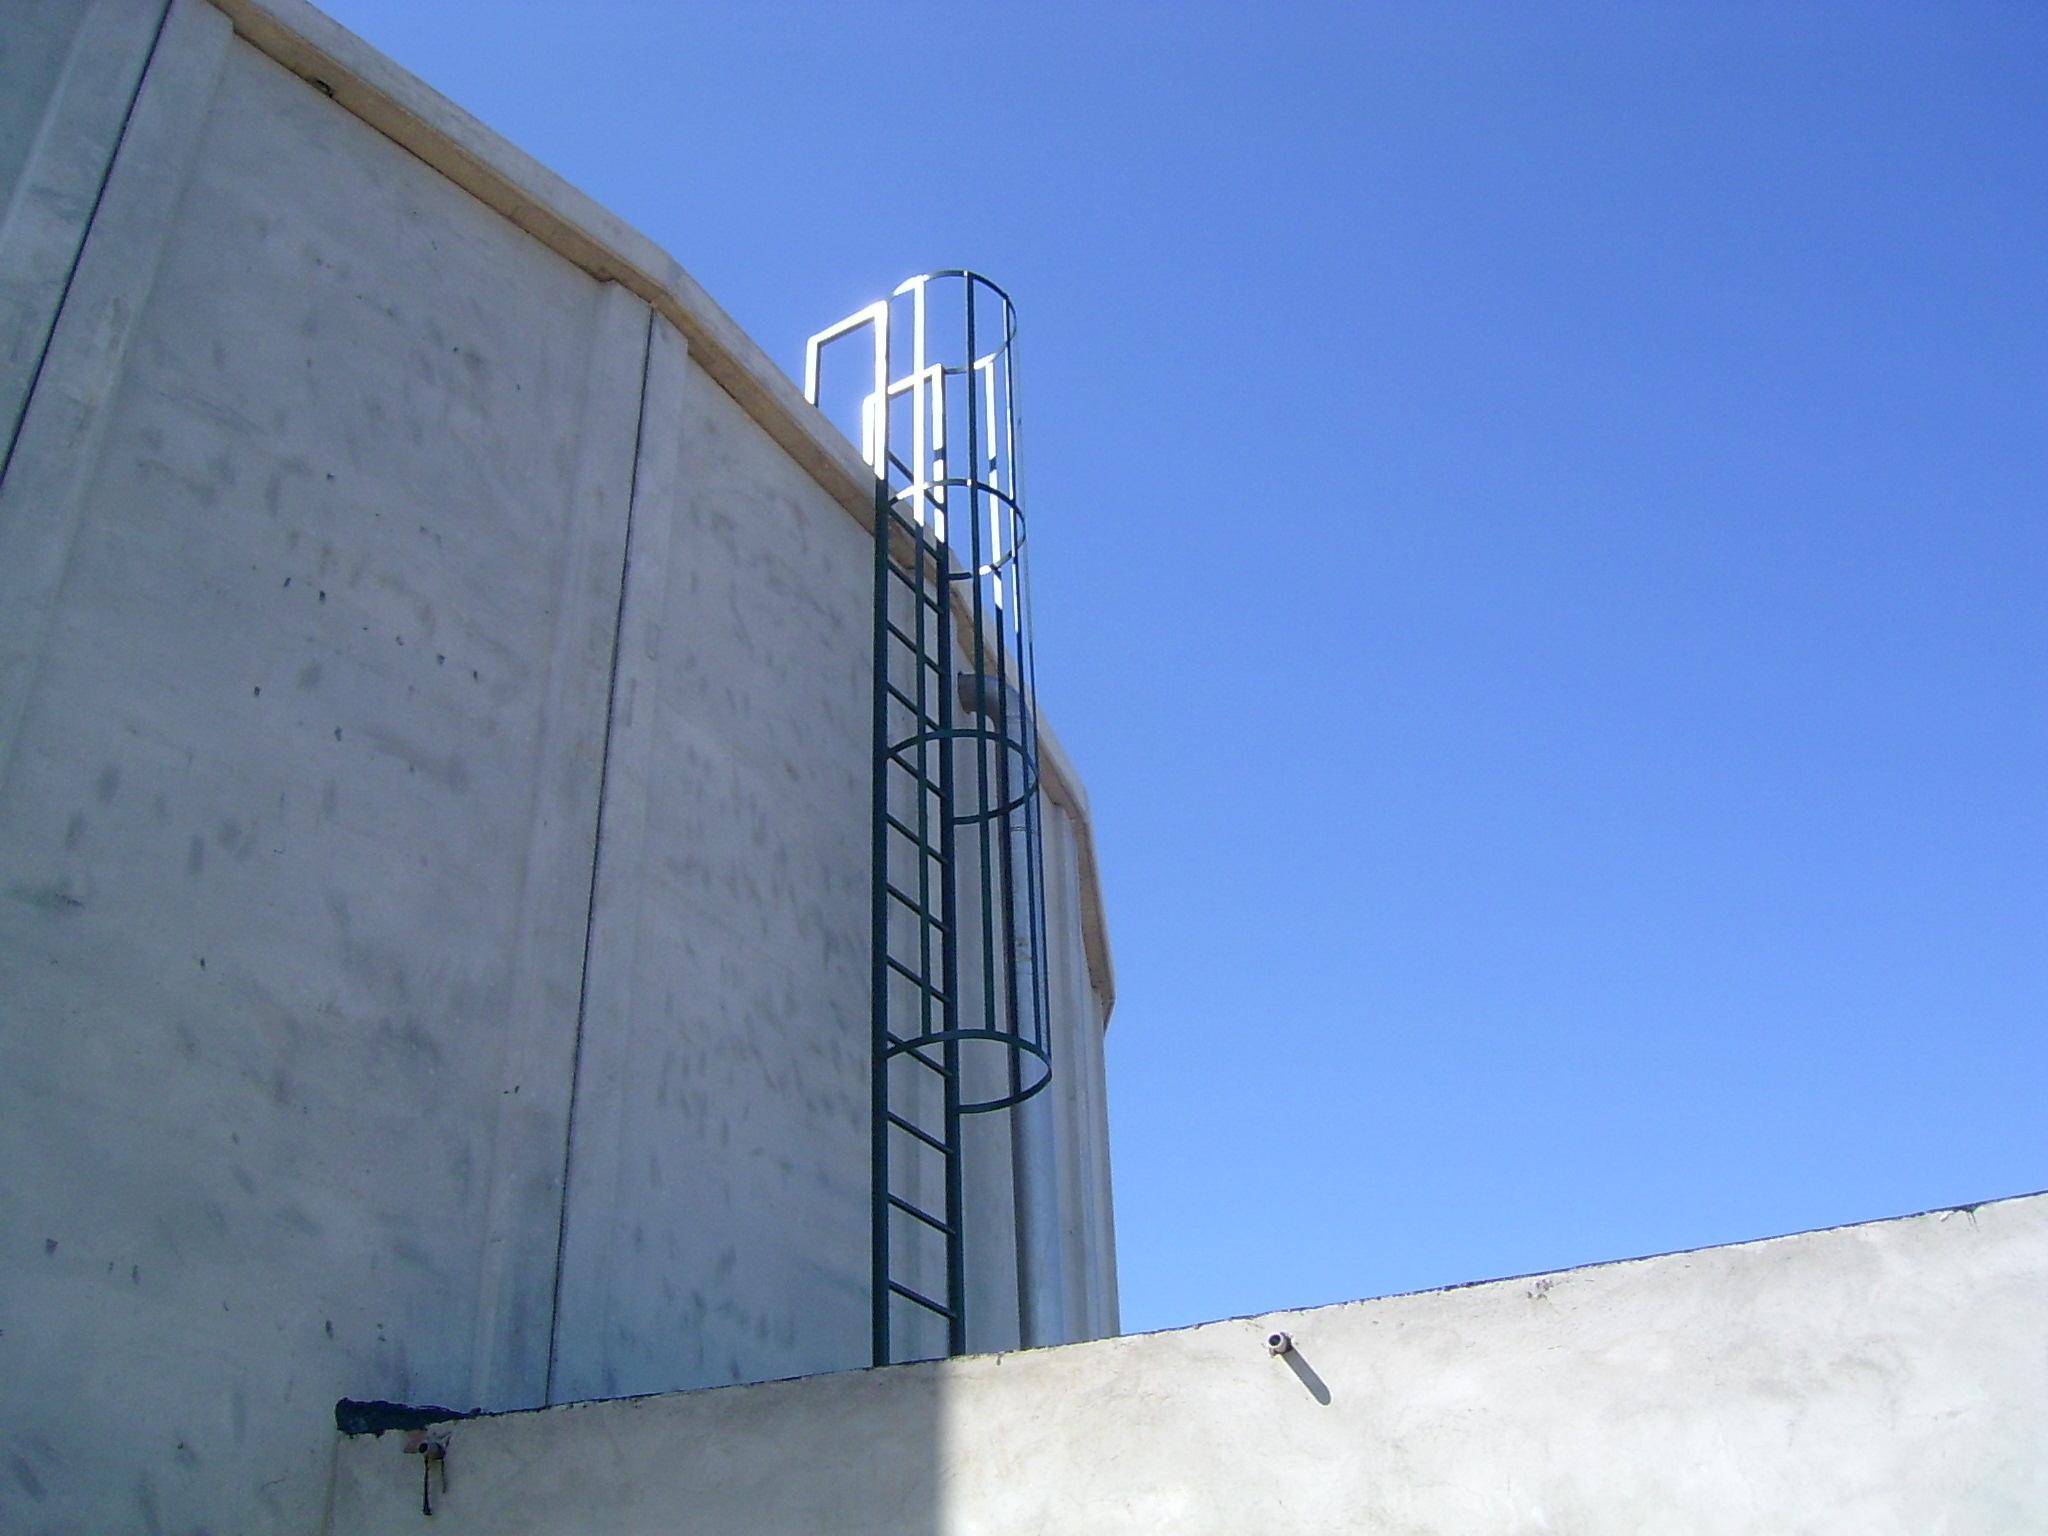 escaleras-mod-013